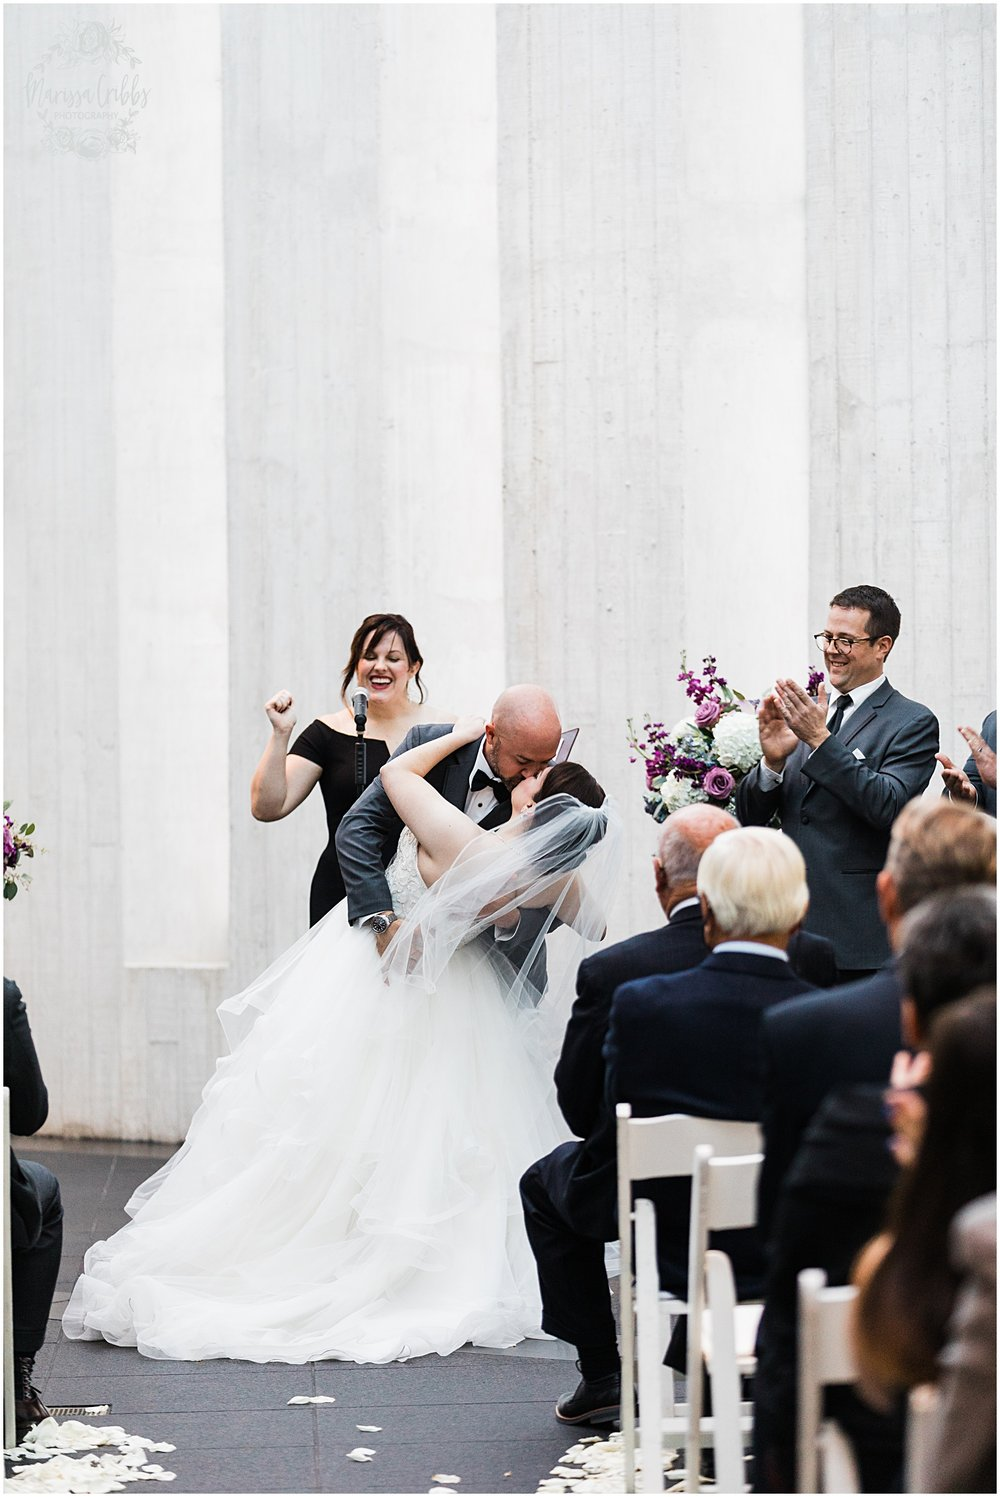 LAURA & DAN MARRIED | NELSON ATKINS MUSEUM | MARISSA CRIBBS PHOTOGRAPHY_7022.jpg